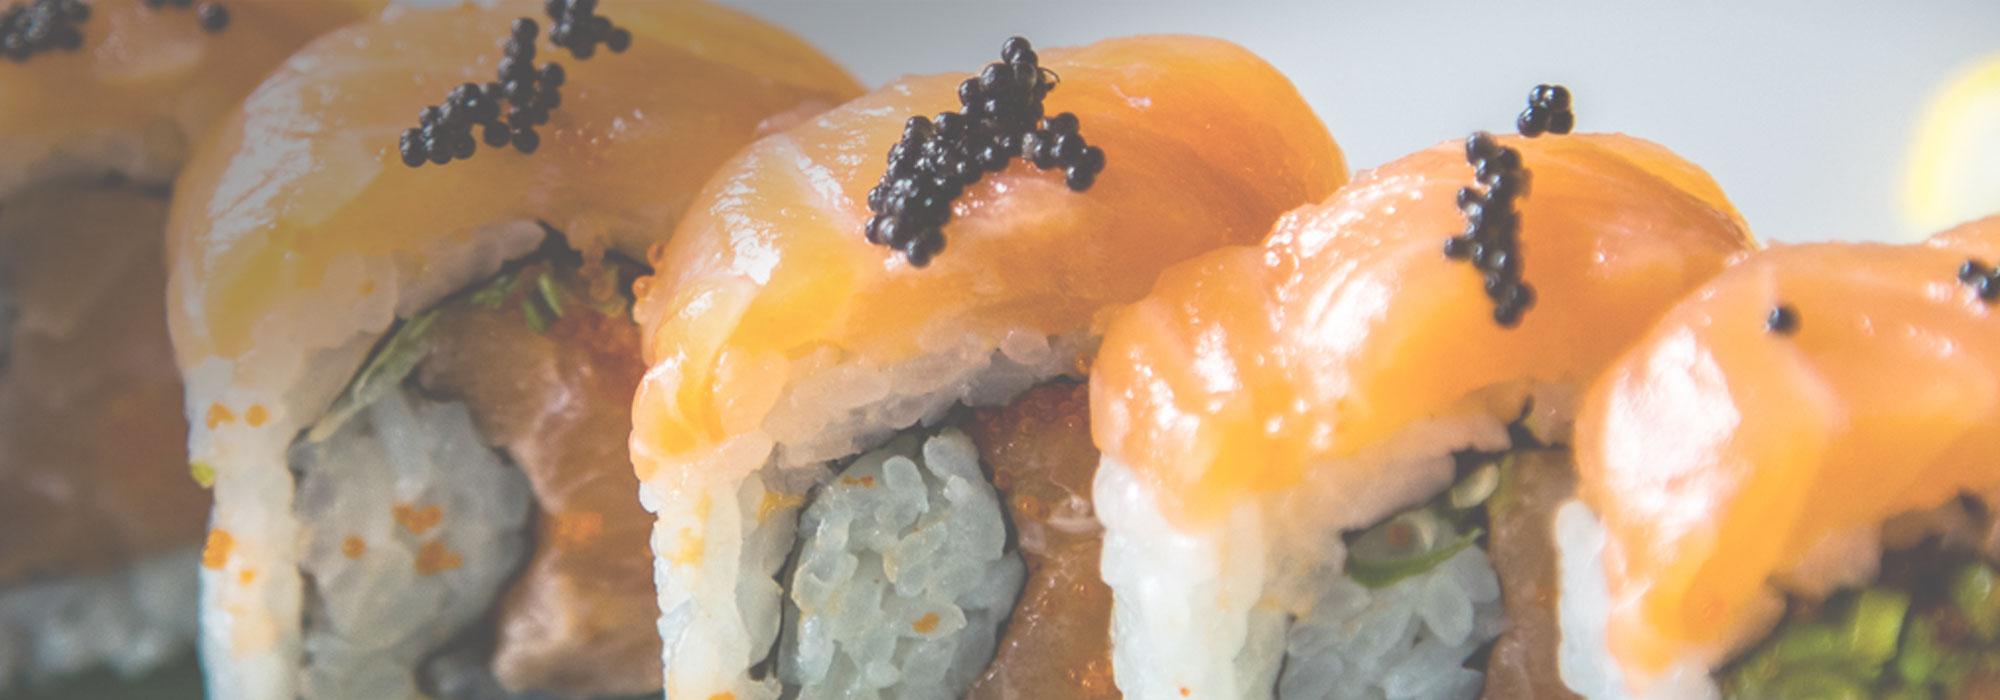 Pawleys Island Sushi Restaurant